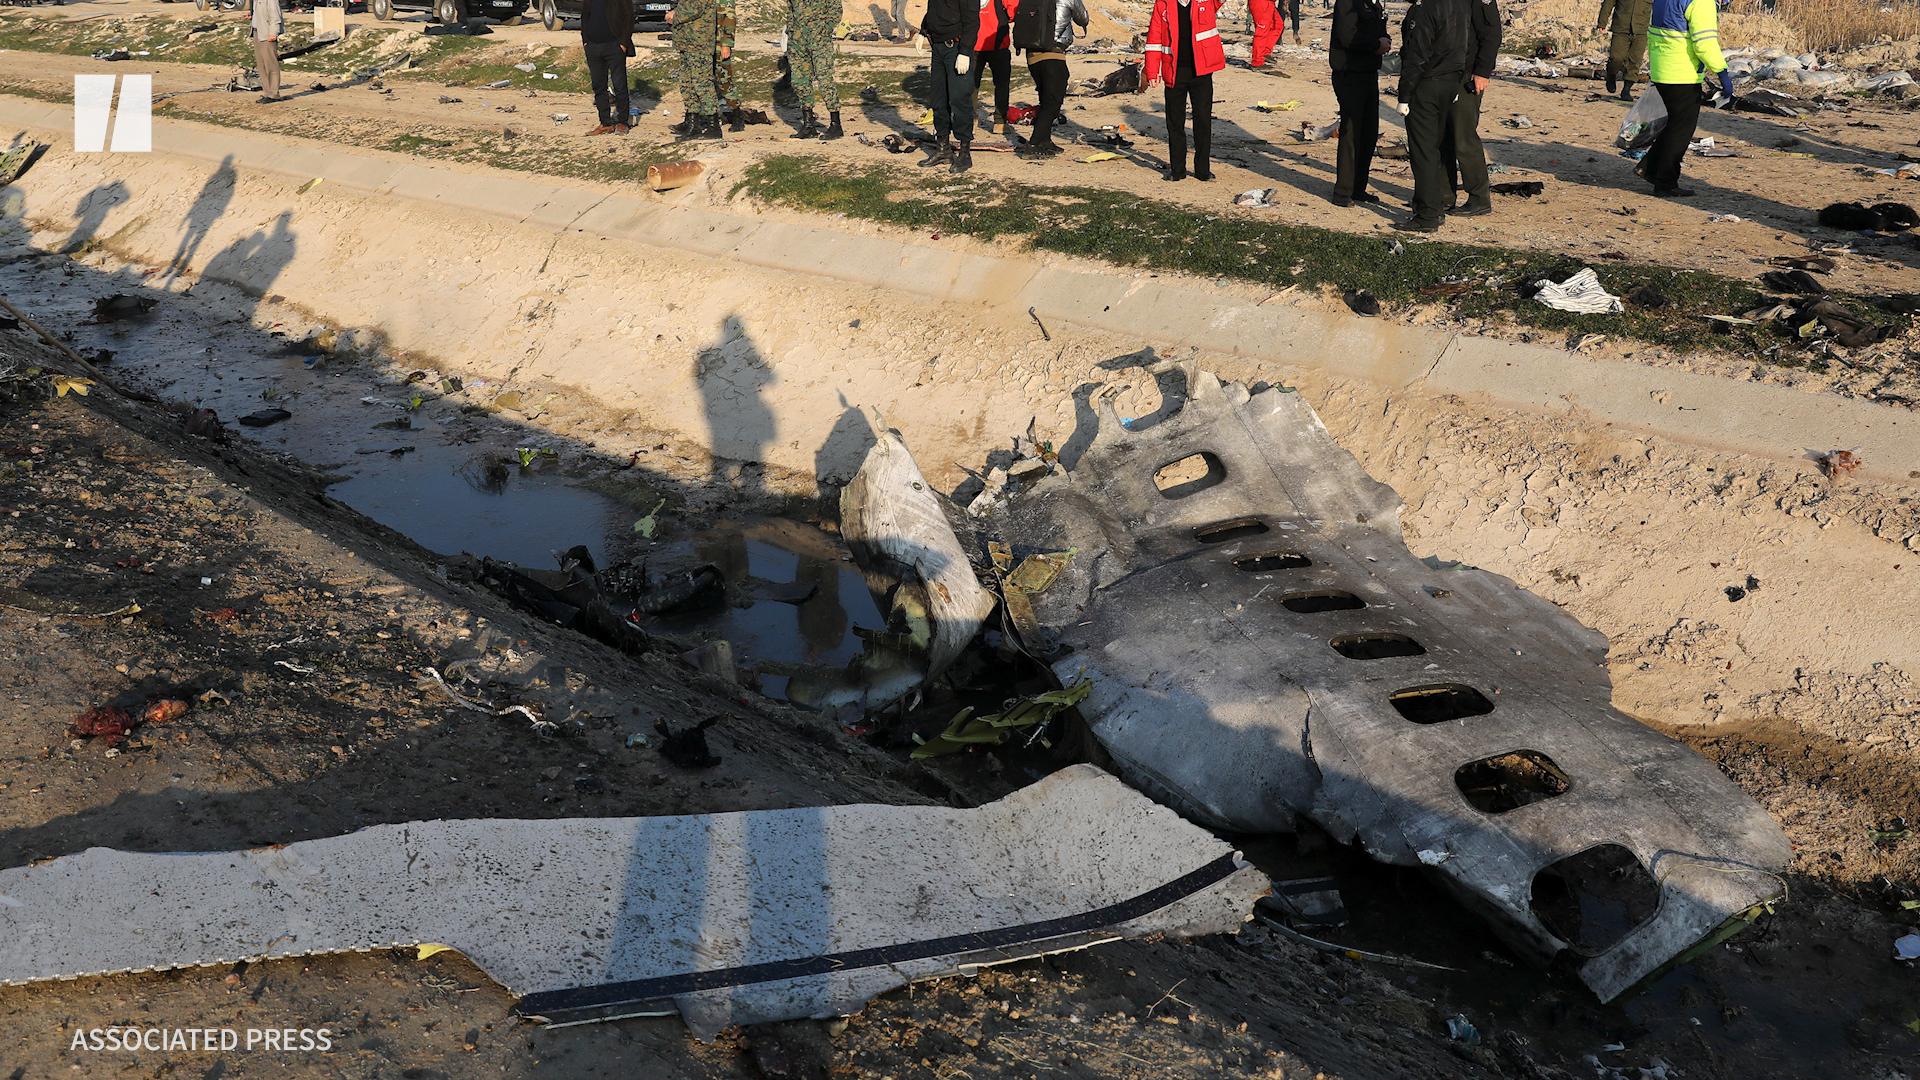 Iran May Have Downed Passenger Plane Killing 176 People, U.S. Officials Say